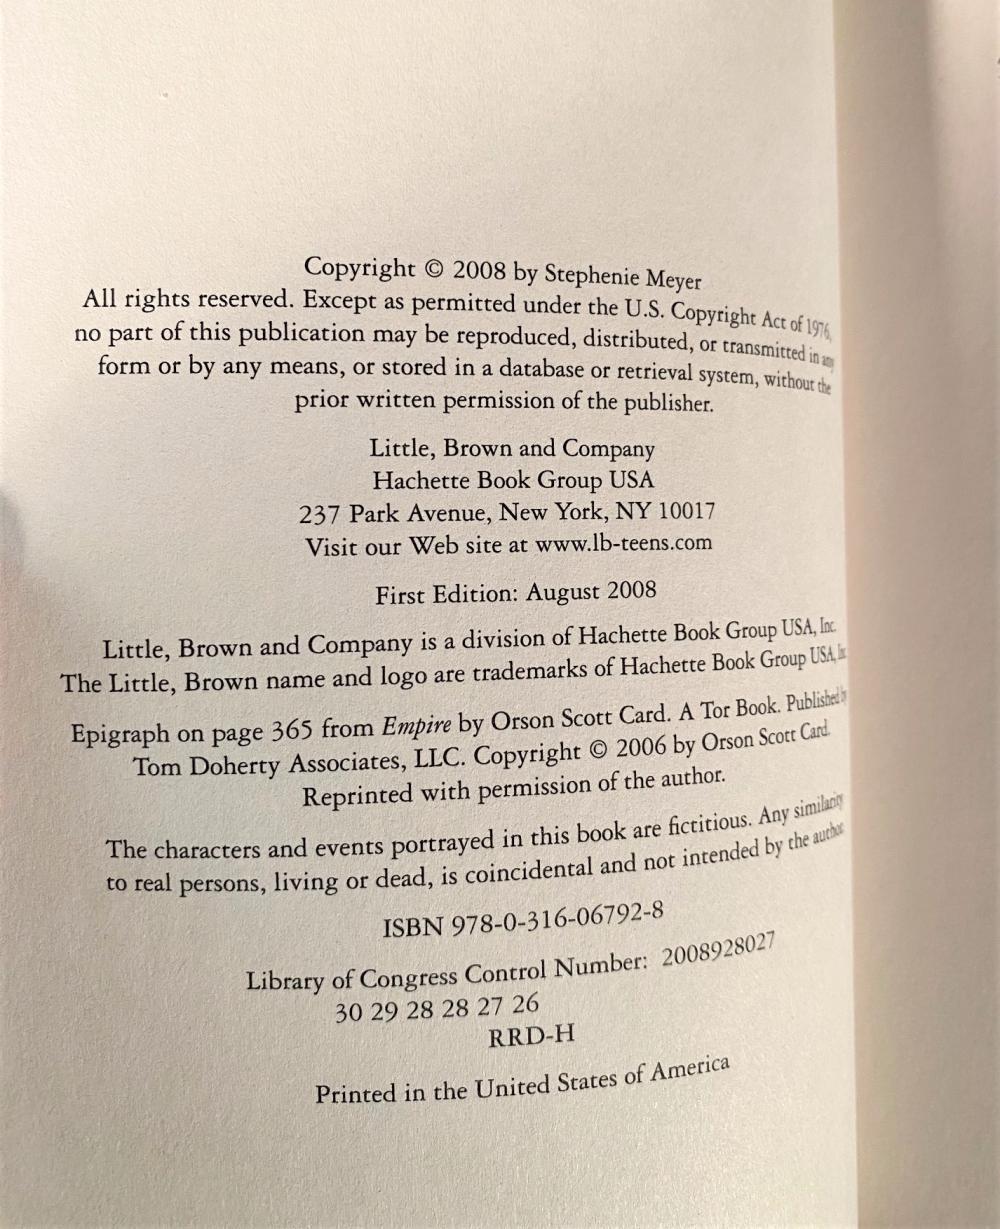 TWILIGHT SAGA COLLECTION HARDCOVER BOX SET - 4 VOLUMES - 2008